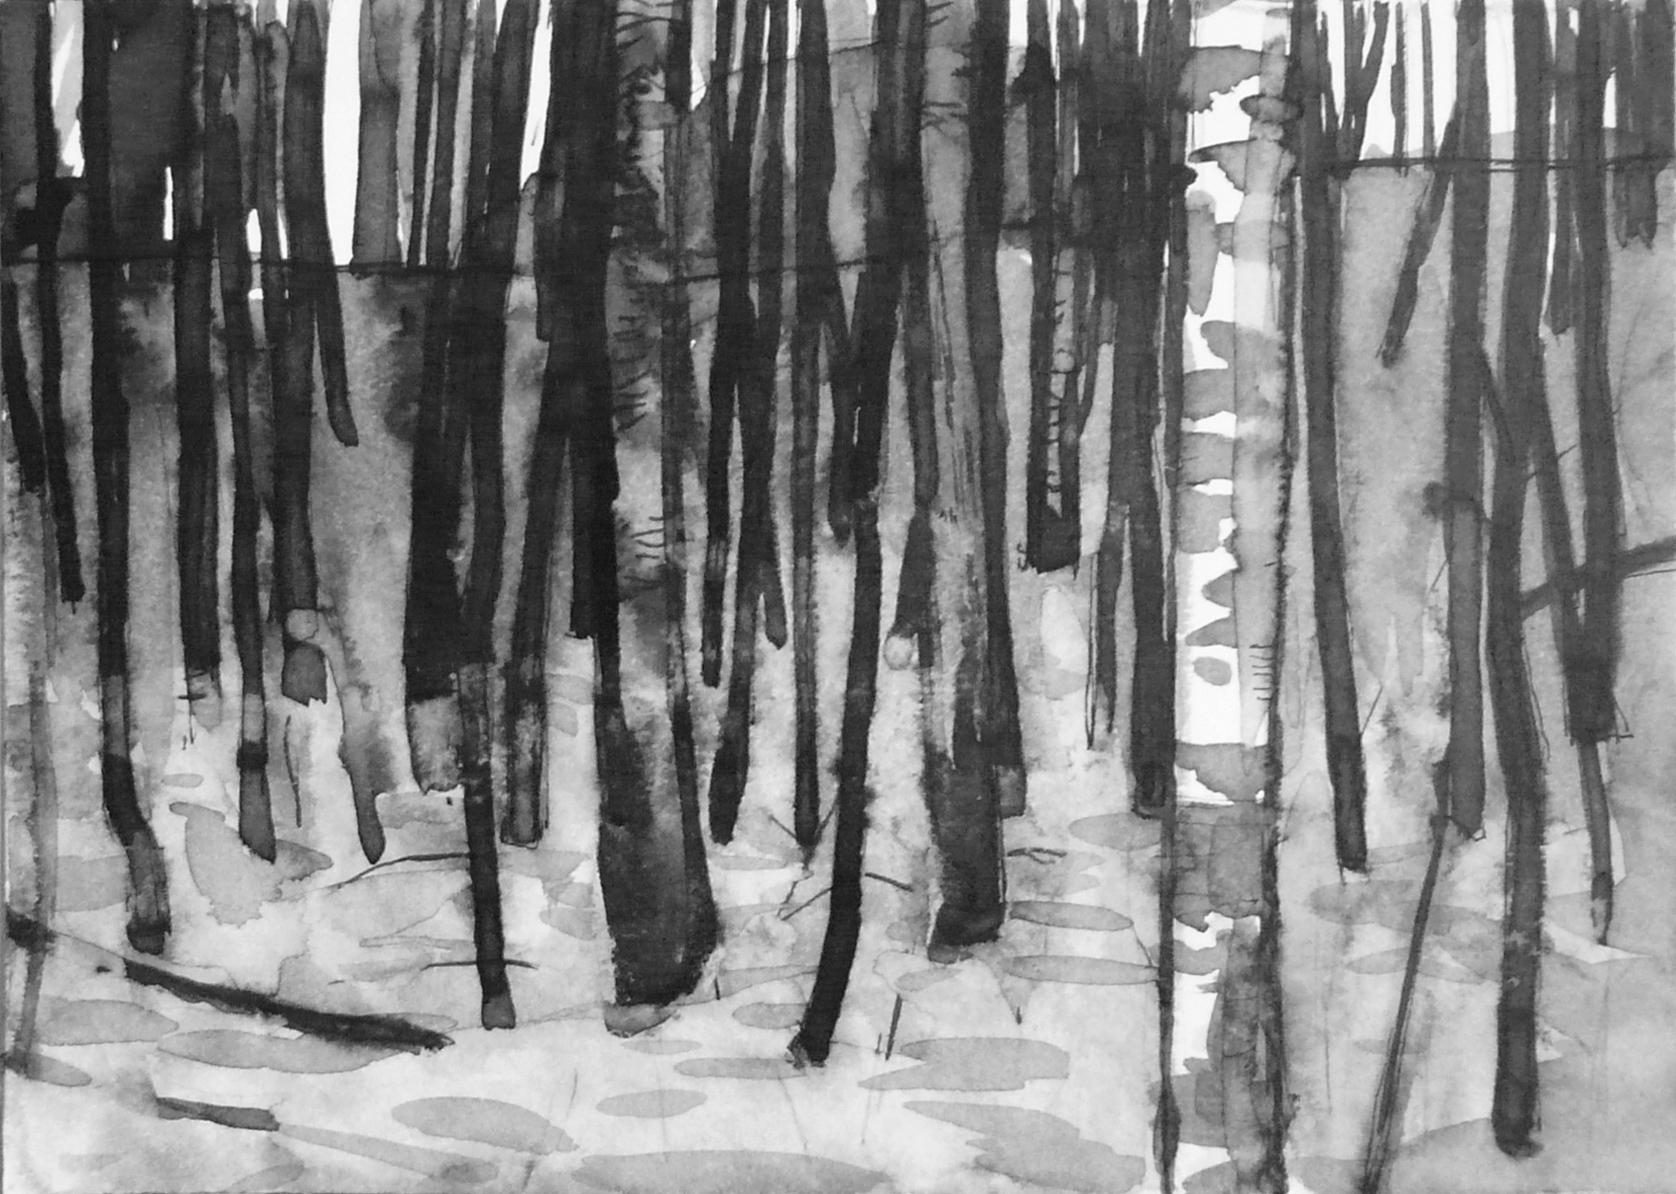 B&W – horizontal 4-6. Ink, paper. 10x15cm. 2015